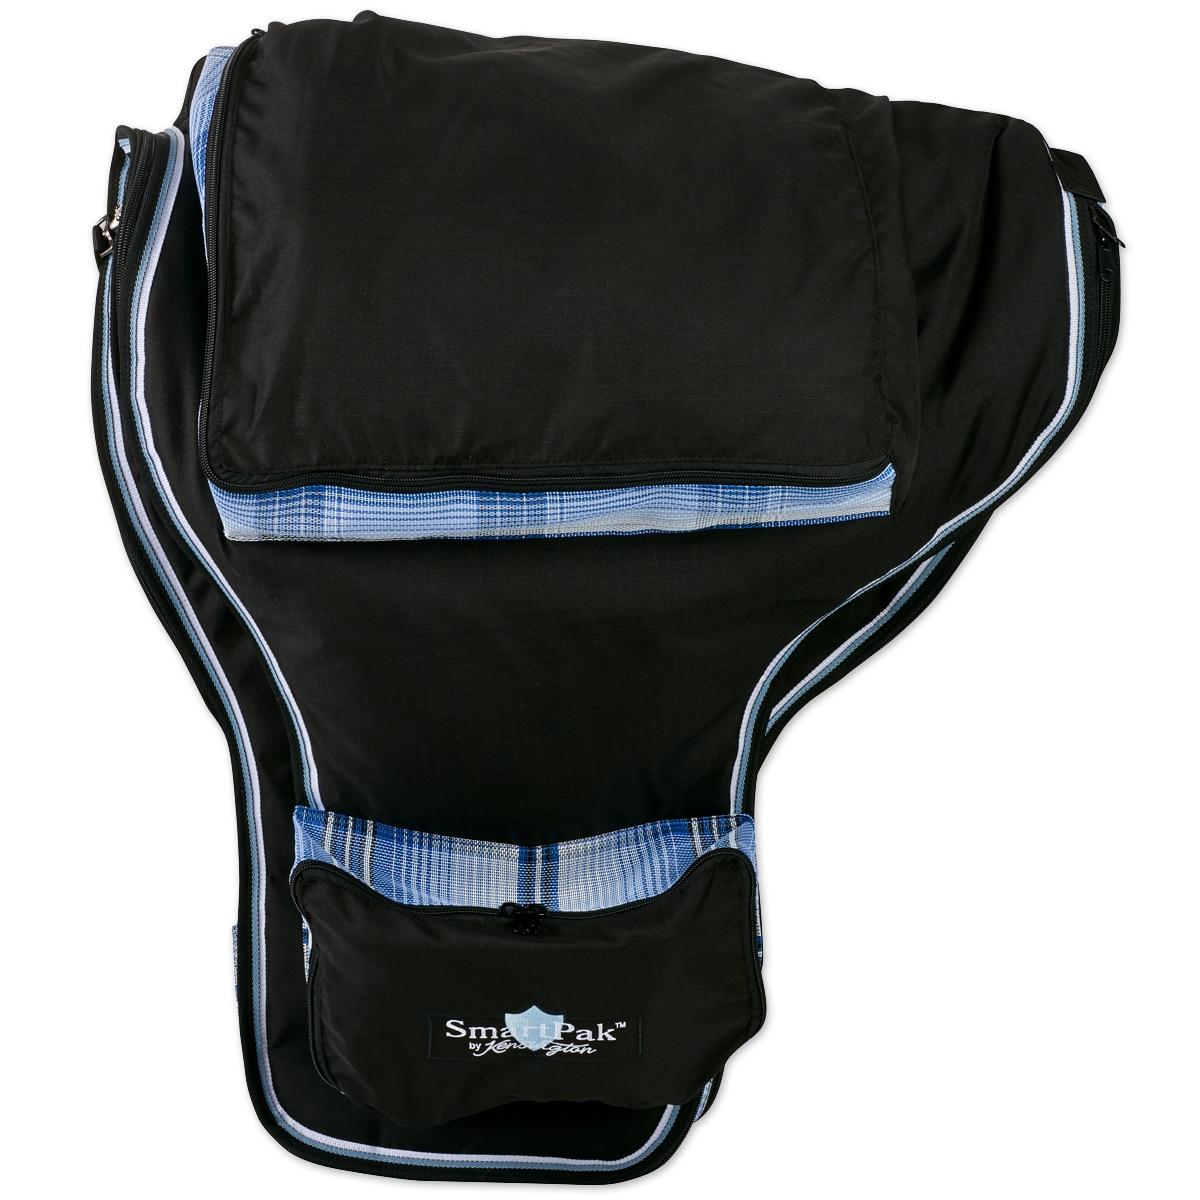 Kensington Signature Western Saddle Carry Bag - Clearance!